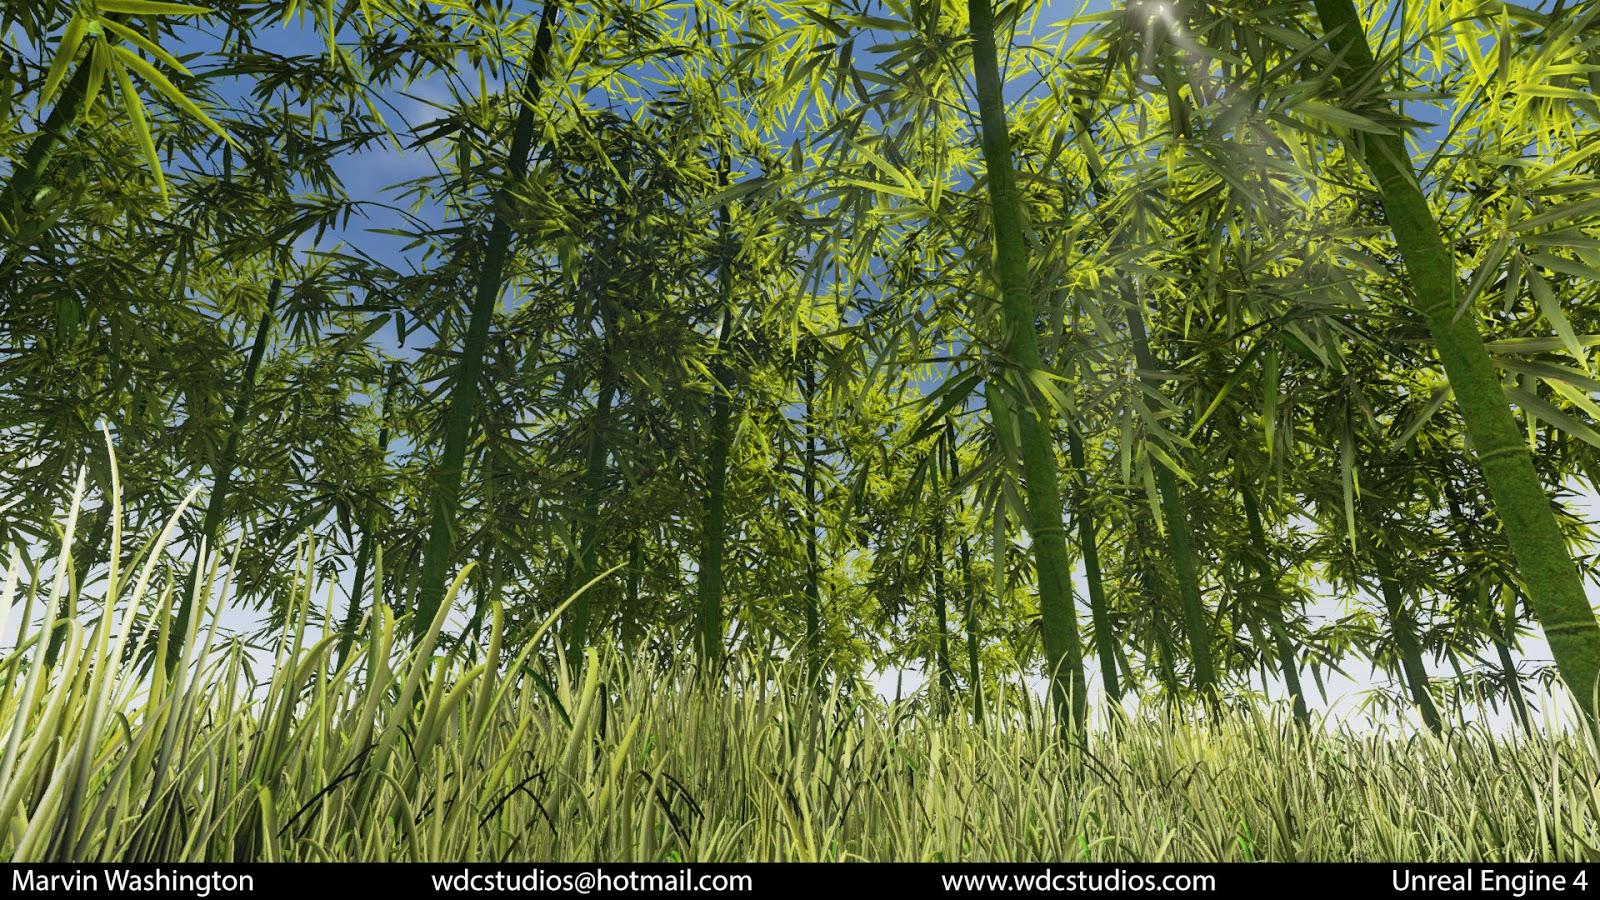 Marvin Washington's Online Gallery: Speedtree UE4 Bamboo Test